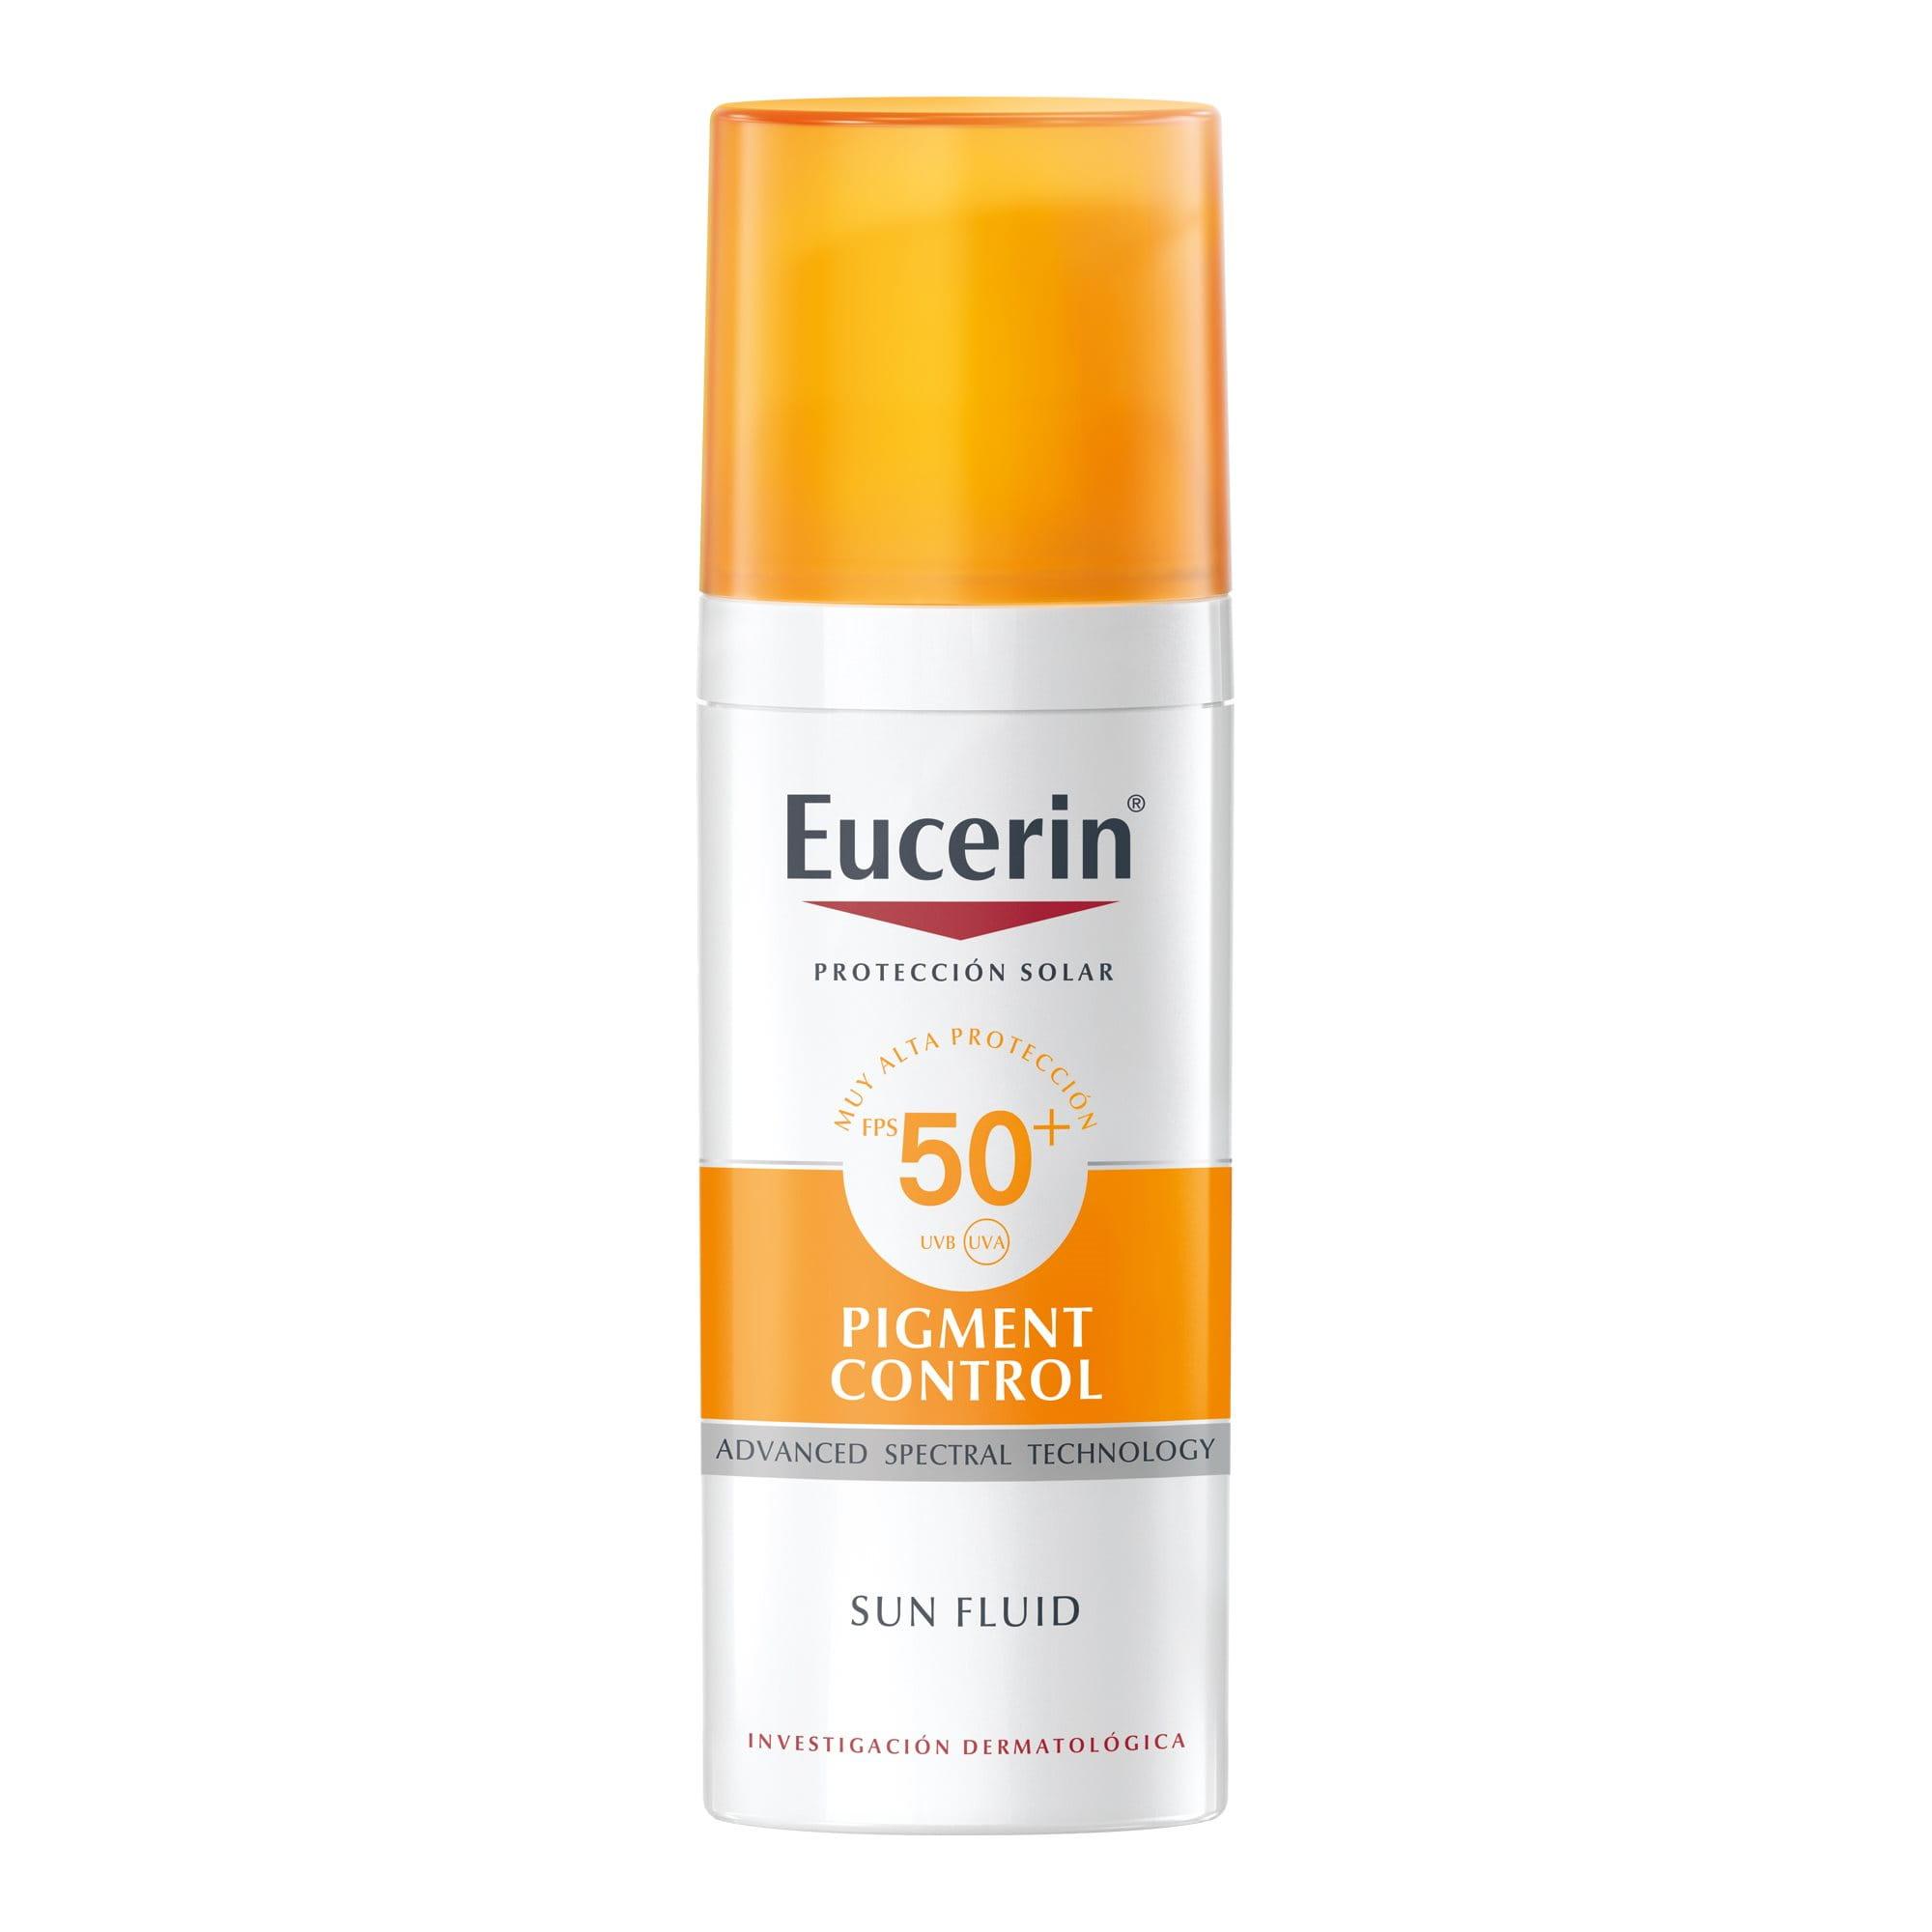 87997-EUCERIN-SUN-FACE-PIGMENT-CONTROL-50ML_packshot